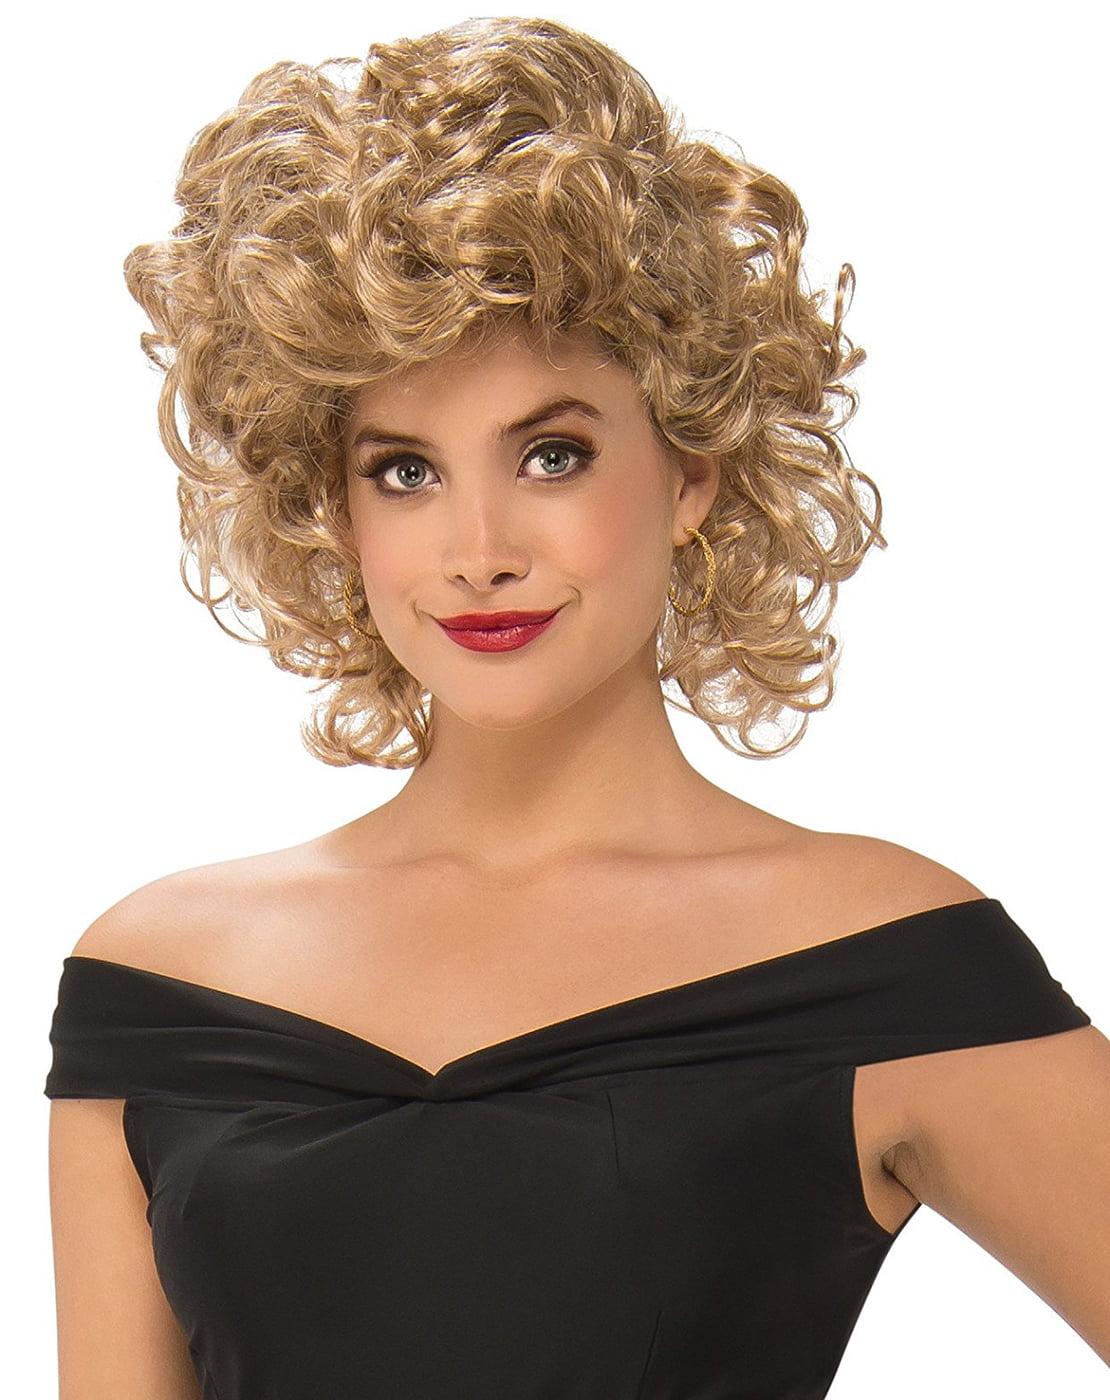 Brown Braid Wig Costume Accessory Adult Oktoberfest